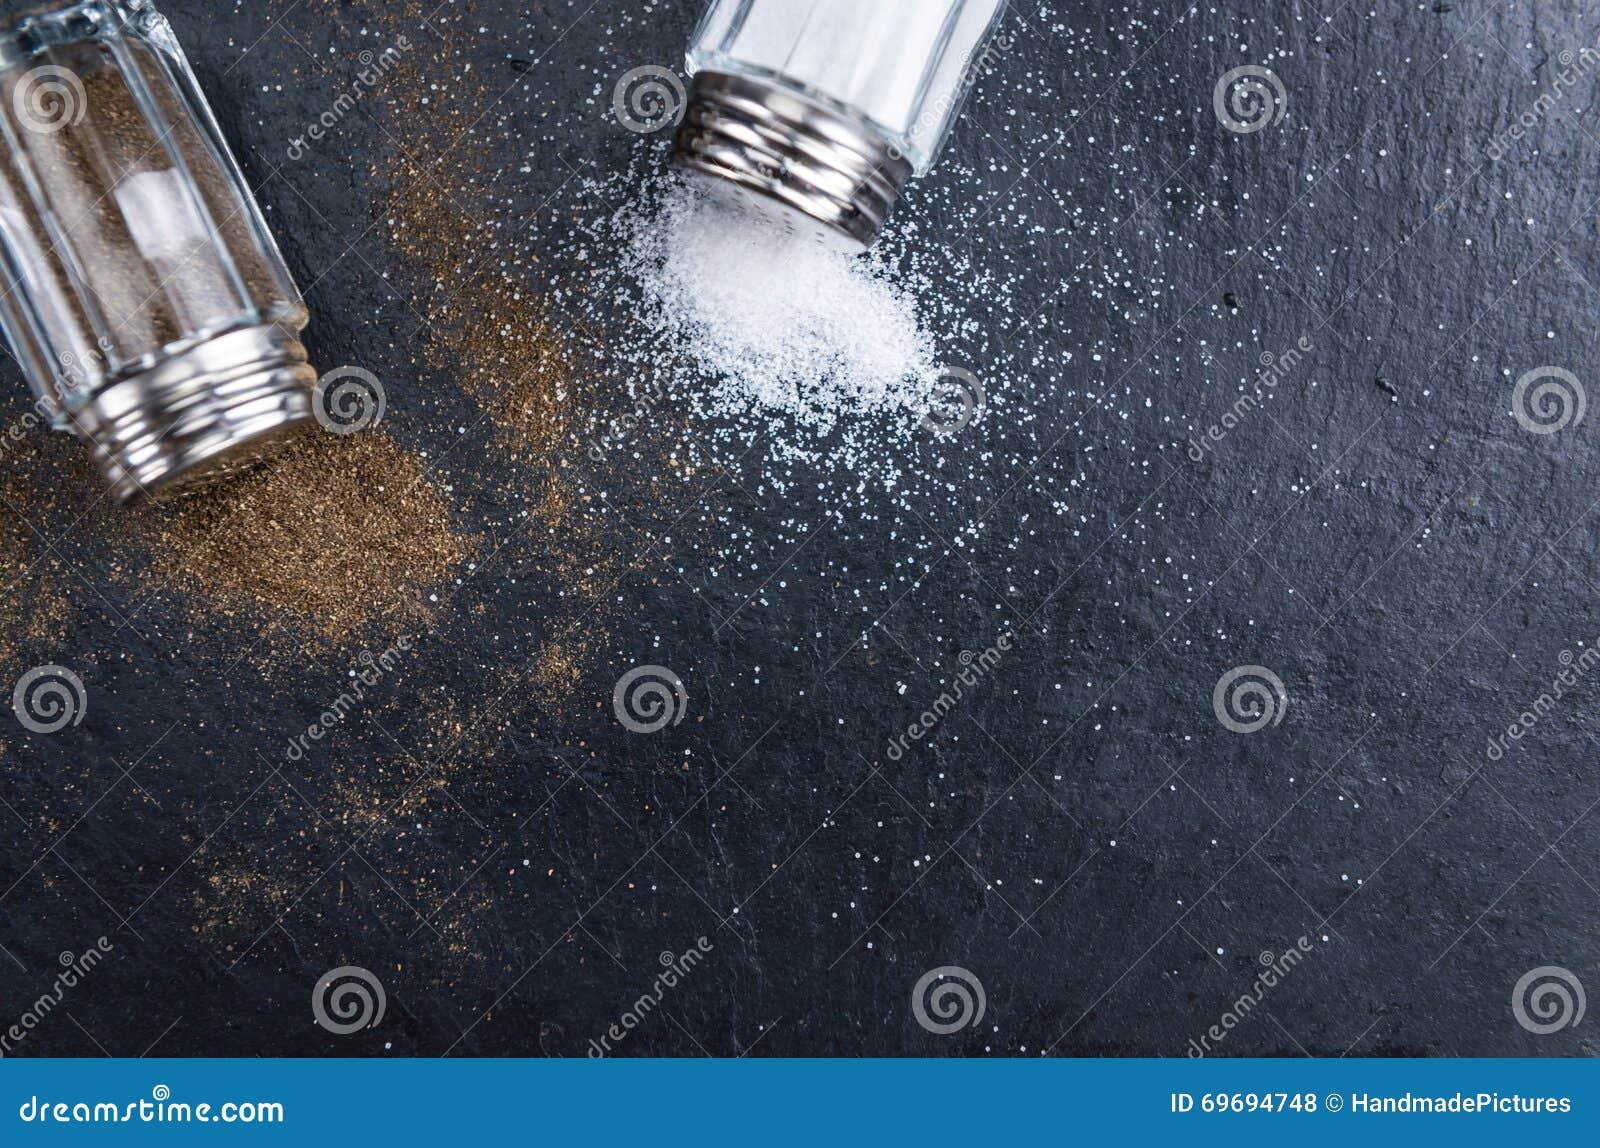 Rustic Salt and Pepper Shaker